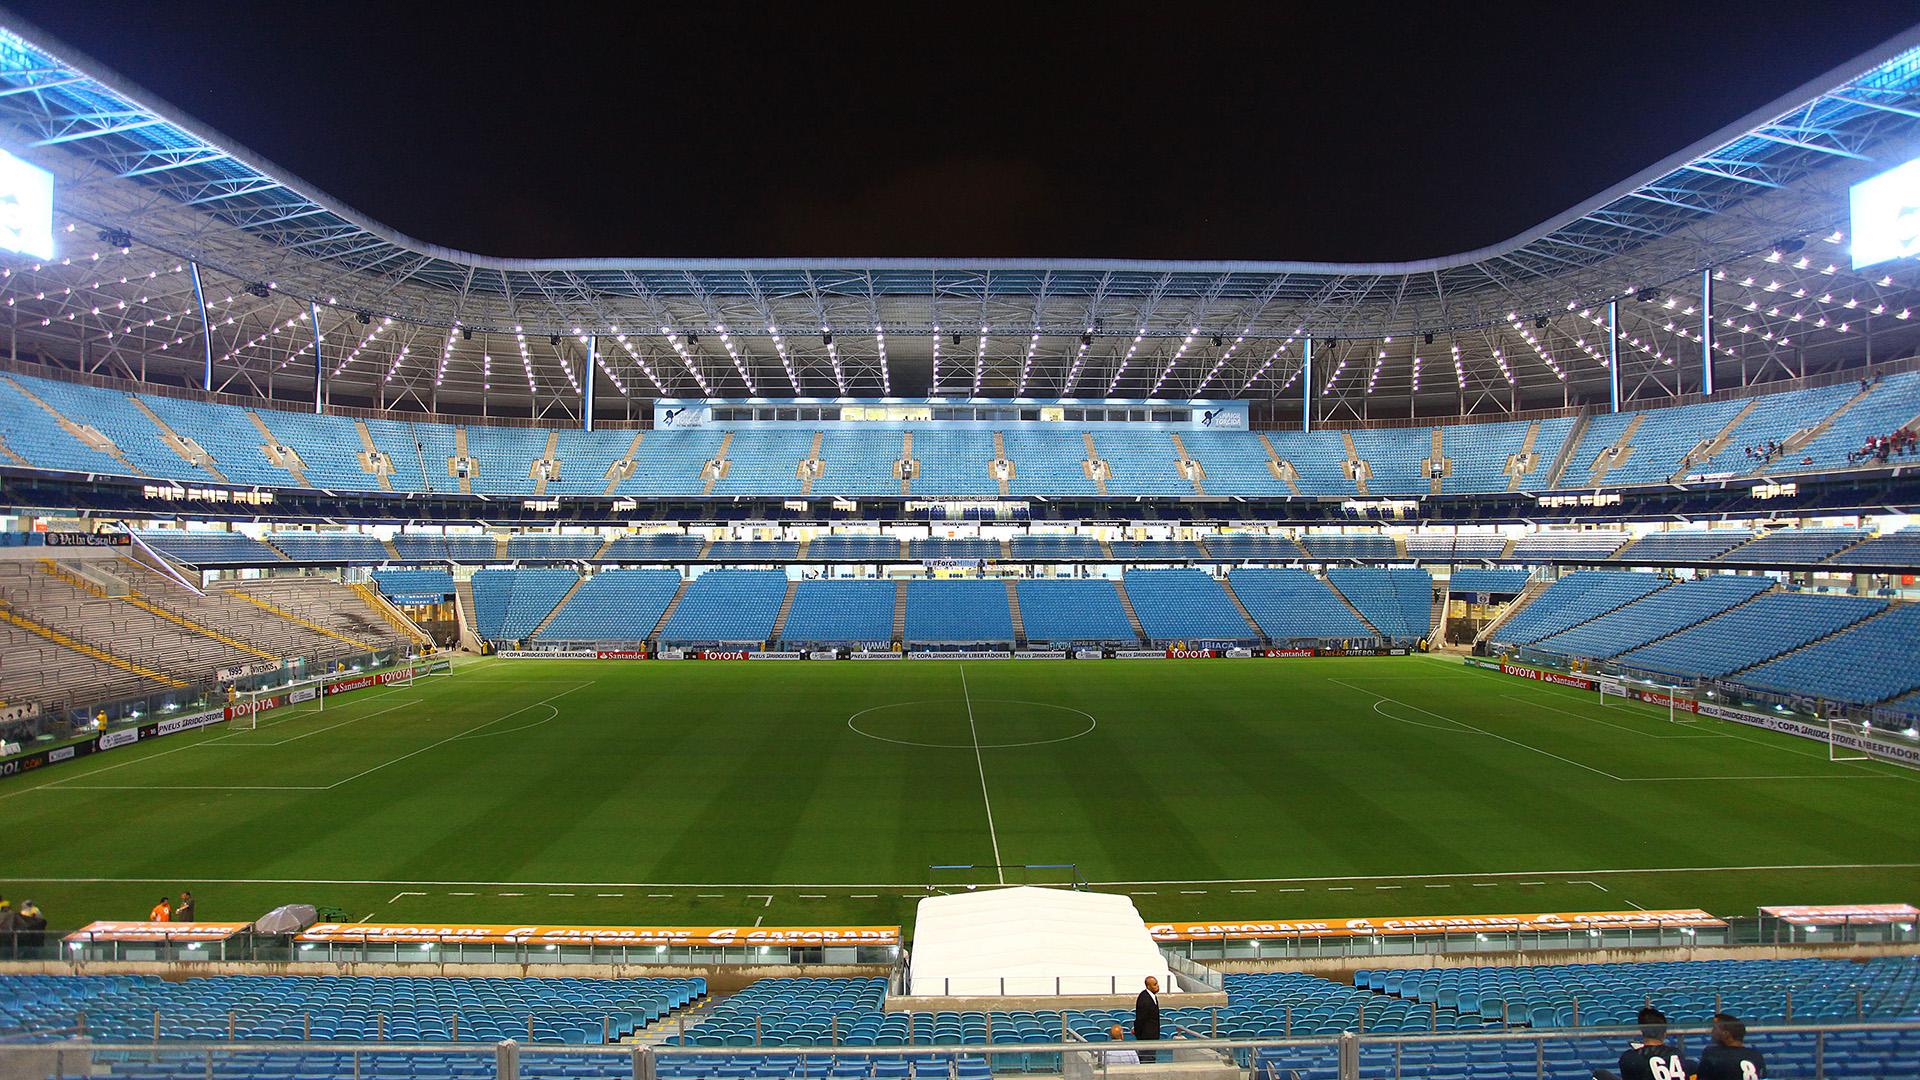 Arena do Grêmio view San Lorenzo Copa Libertadores 03092016